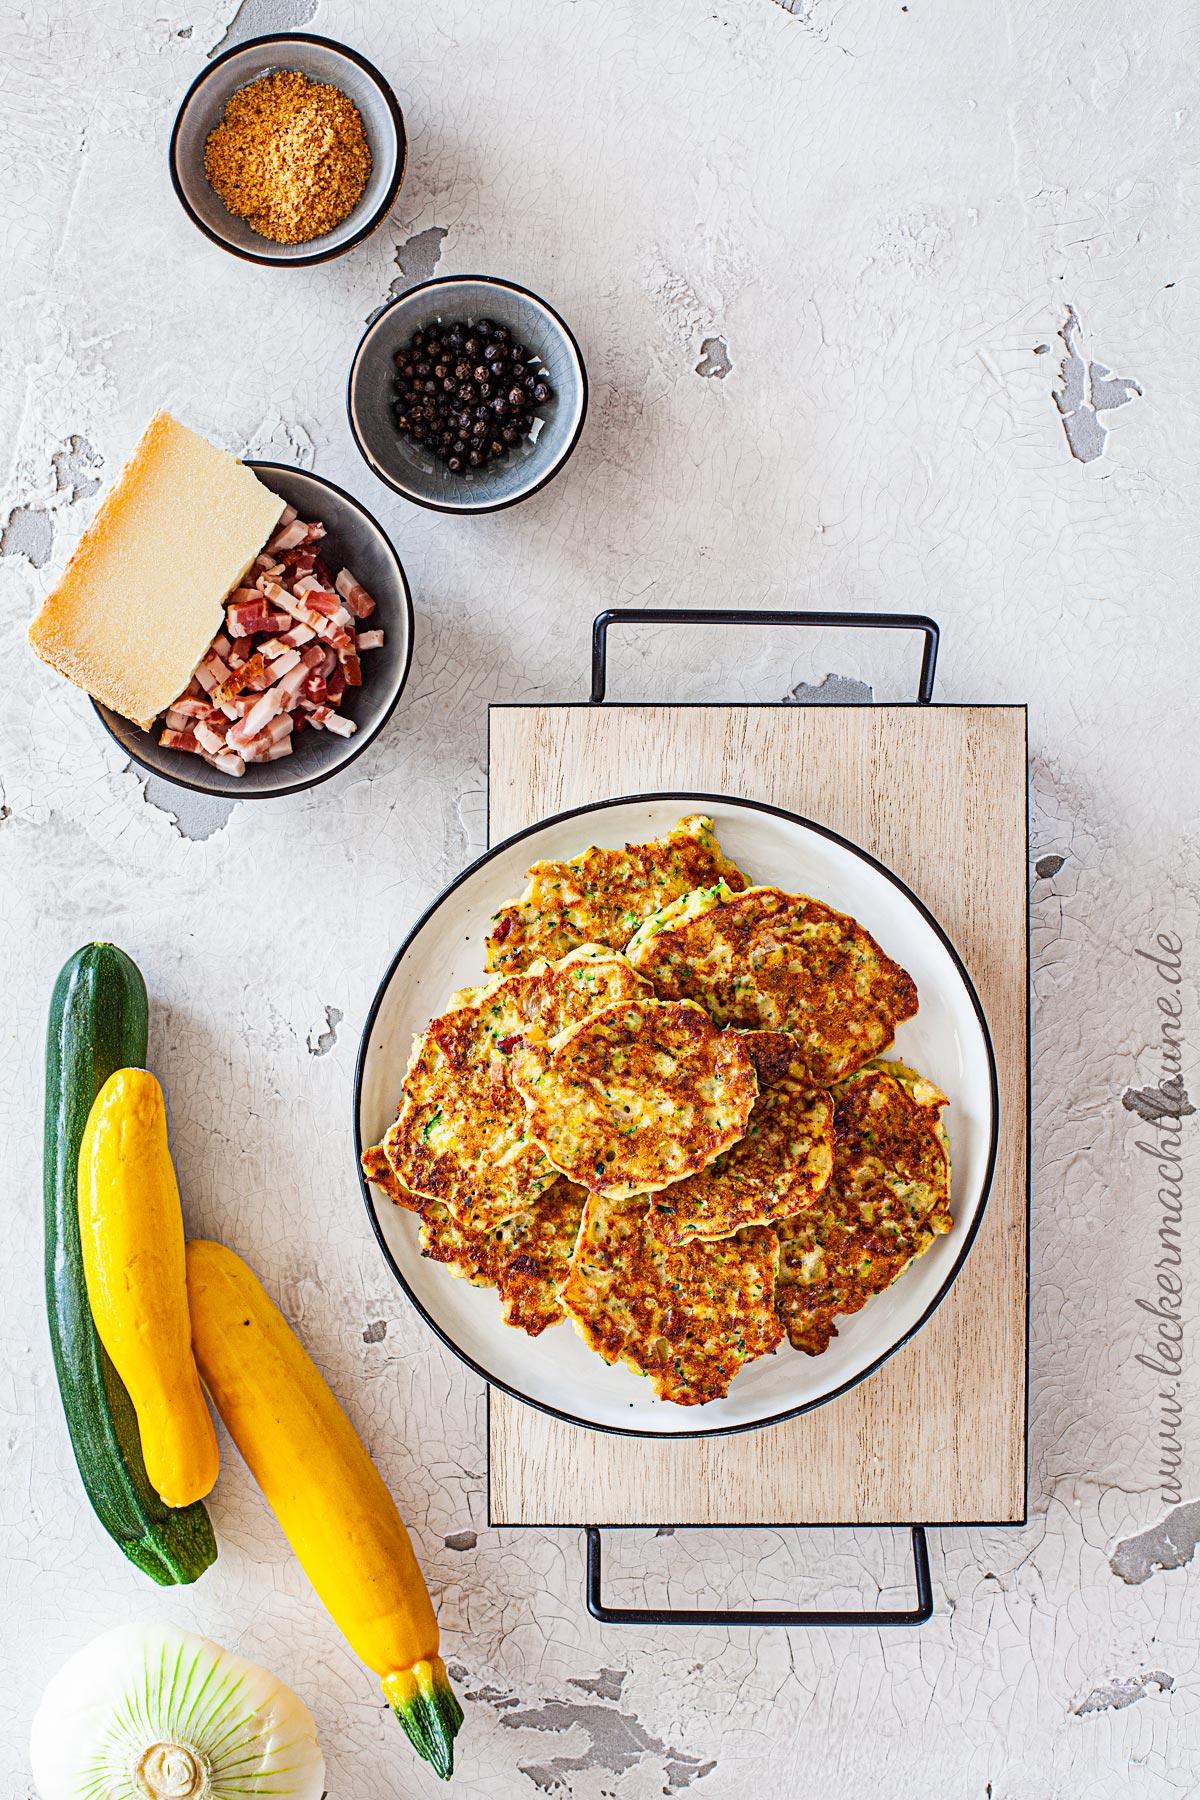 Zucchini-Ricotta-Puffer   lecker macht laune